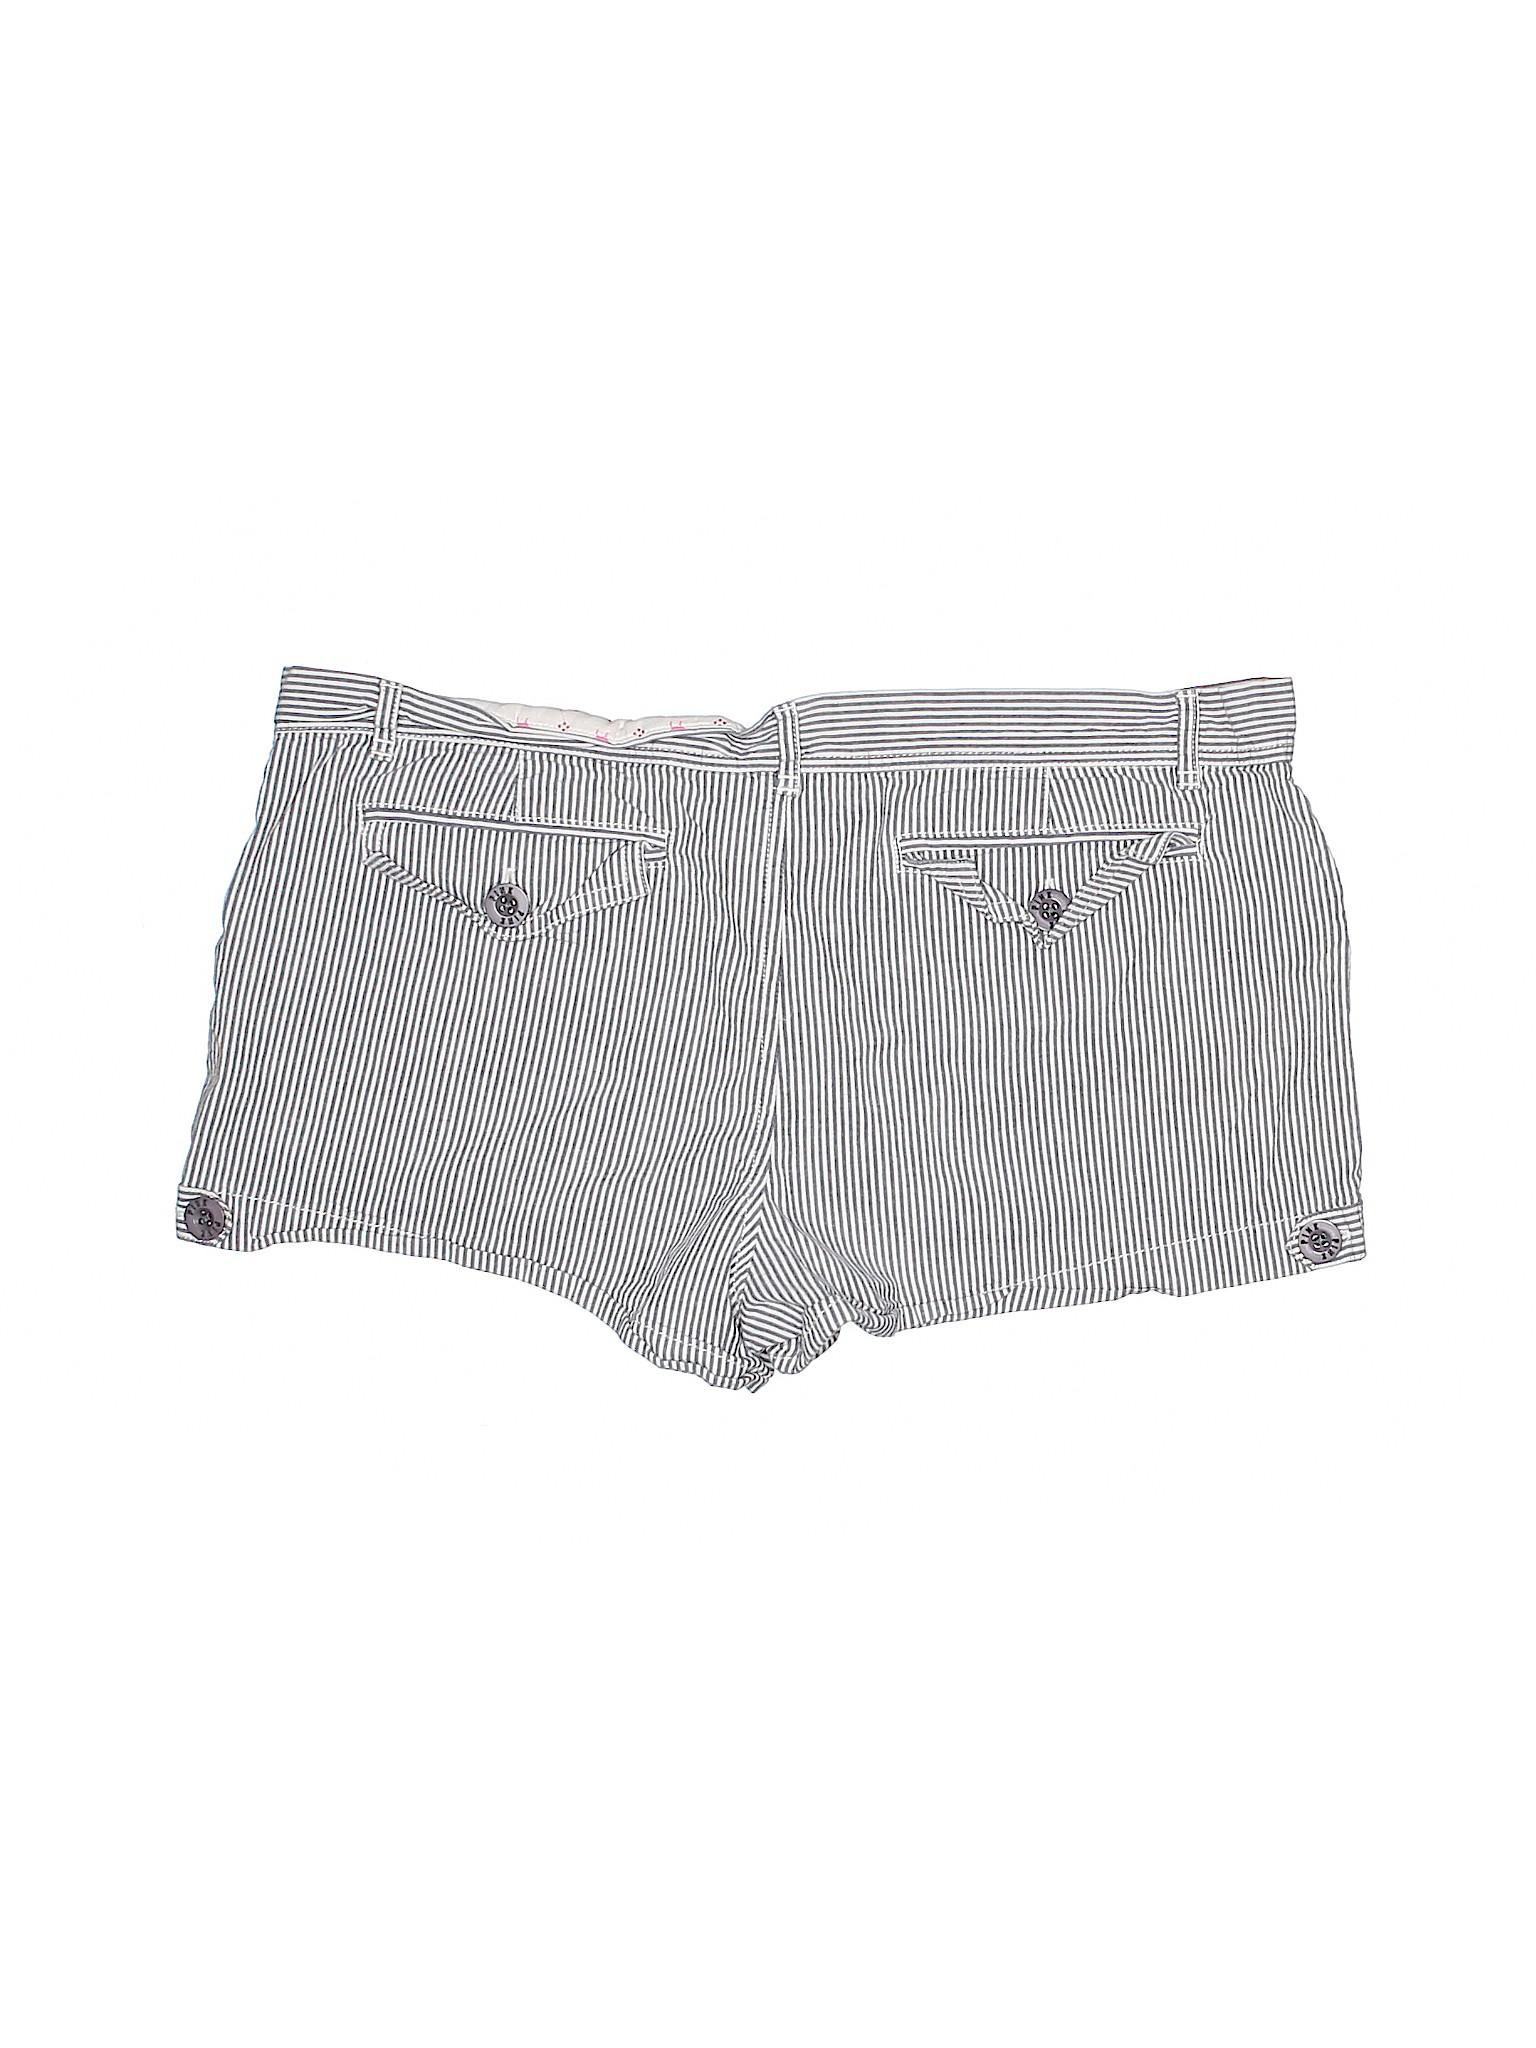 Victoria's Leisure winter Khaki Secret Pink Shorts Tgqg5Yn